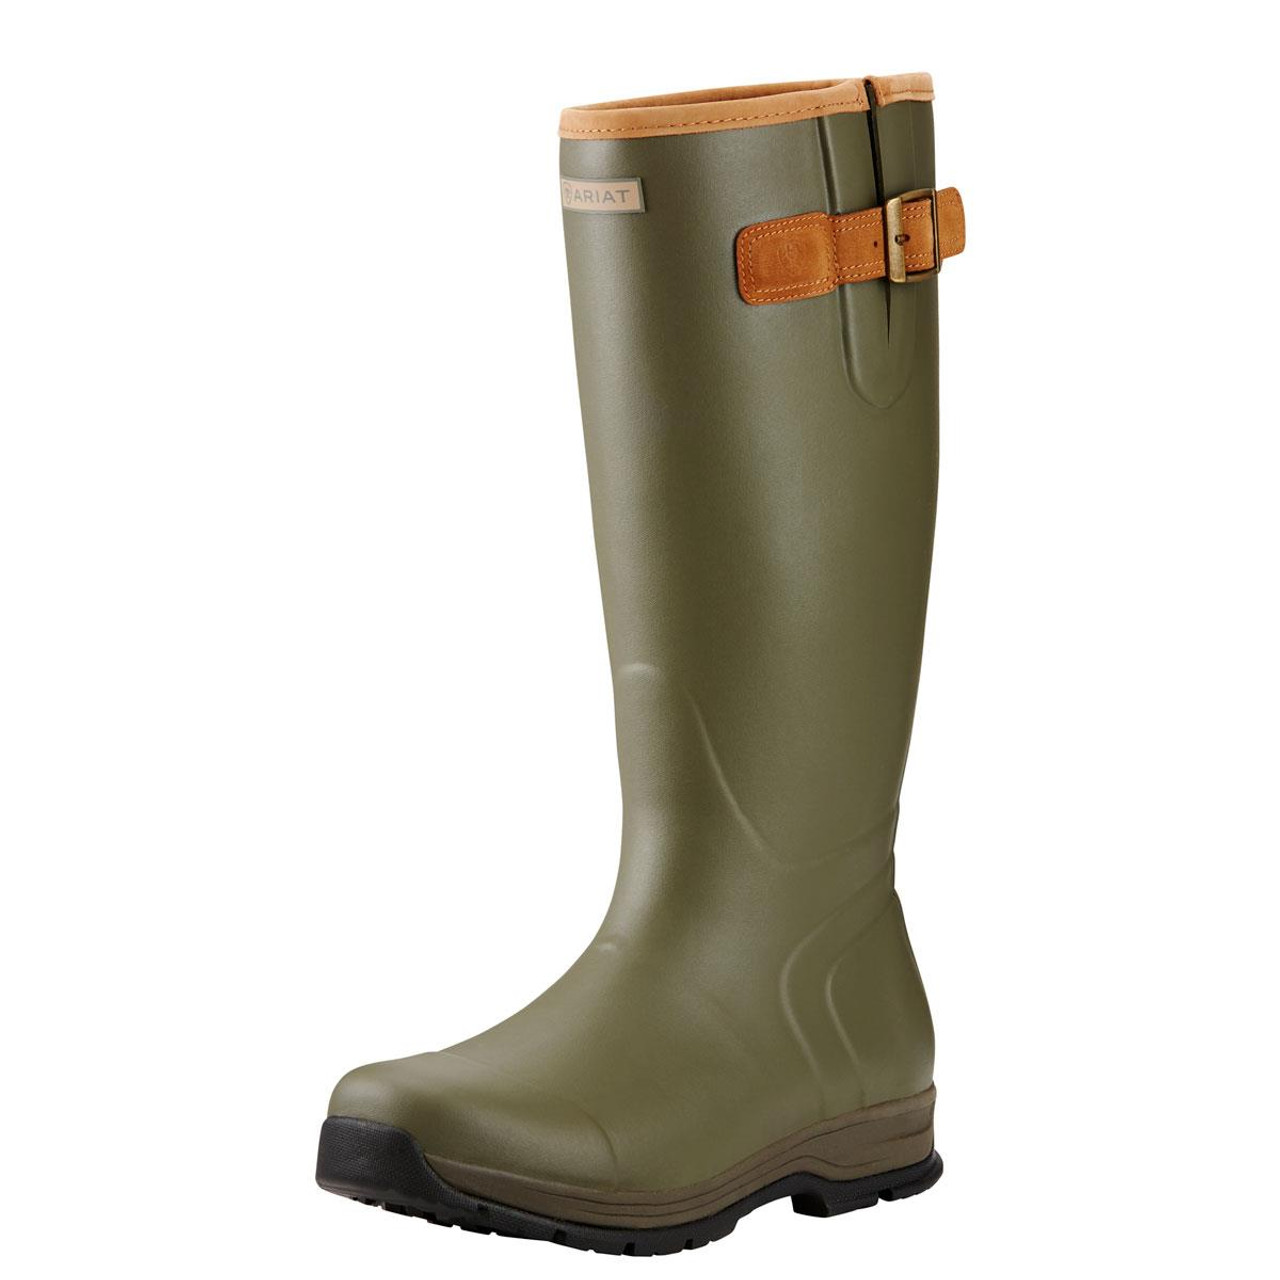 Ariat Burford Mens Wellington Boots